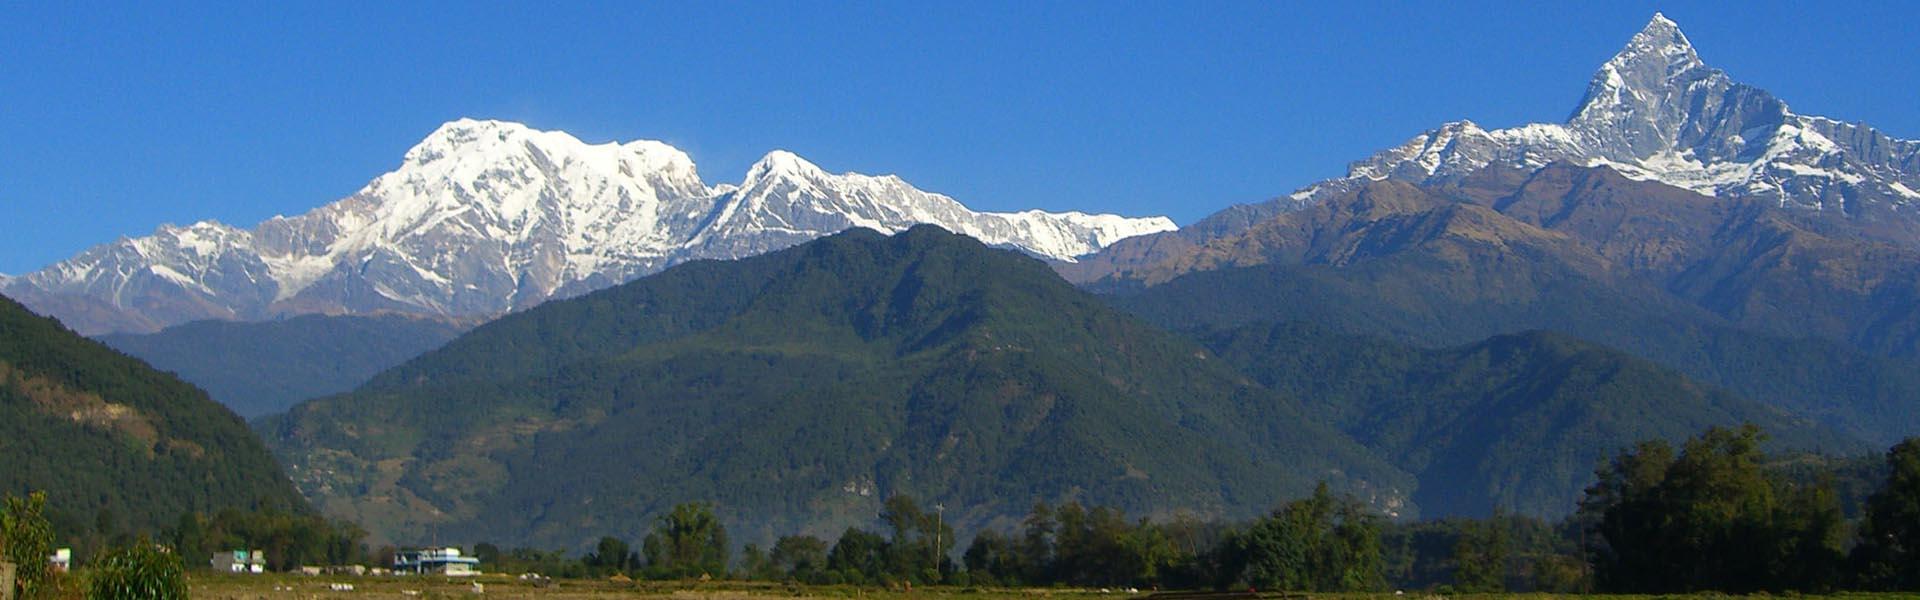 Pokhara honeymoon tour